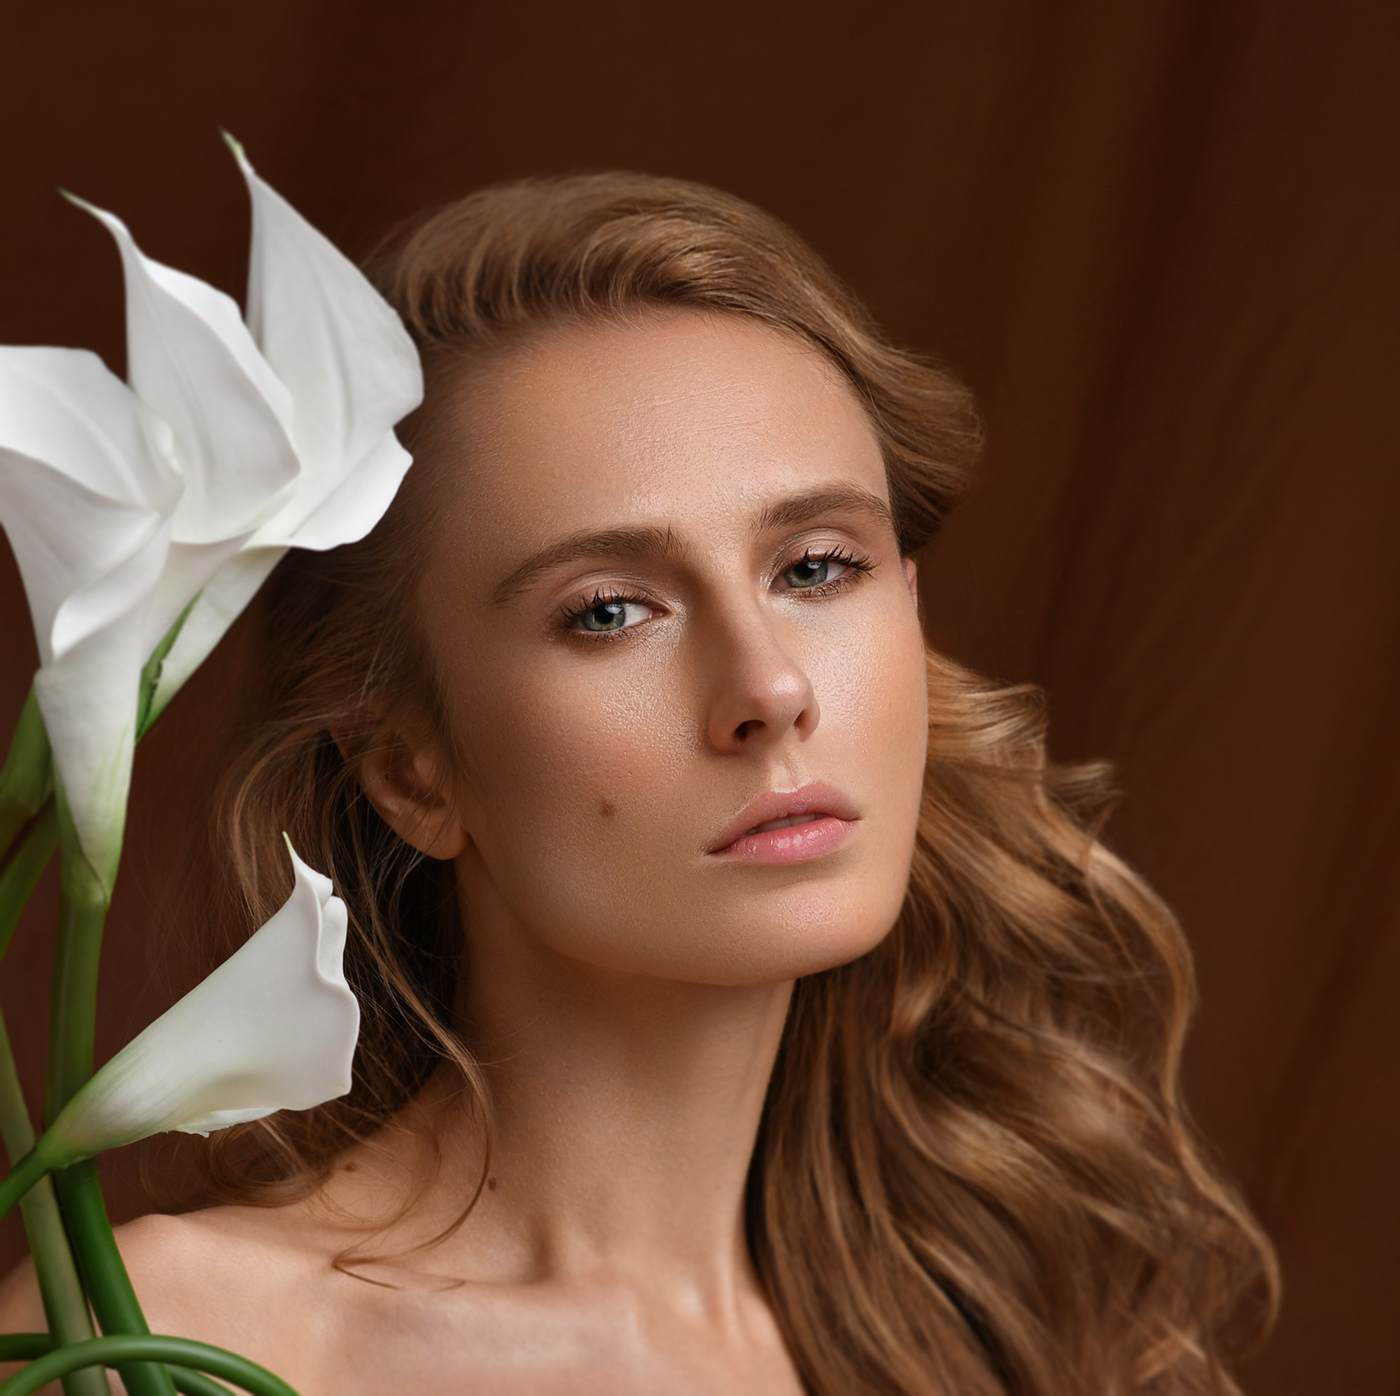 Cālla / фотограф Svetlana Efimova модель Natalya Makaruk